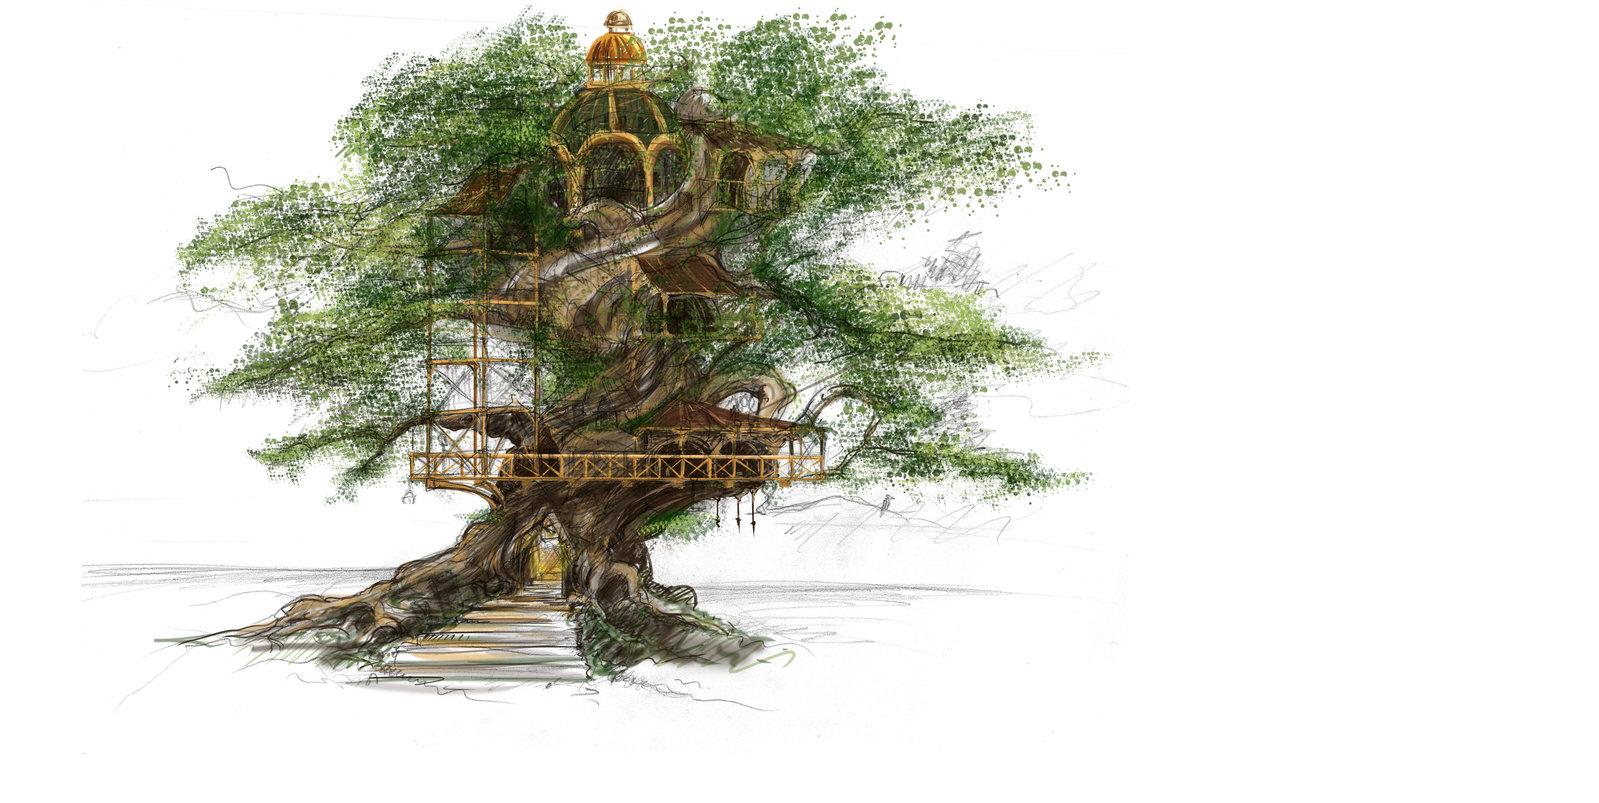 The Tree_2.jpg